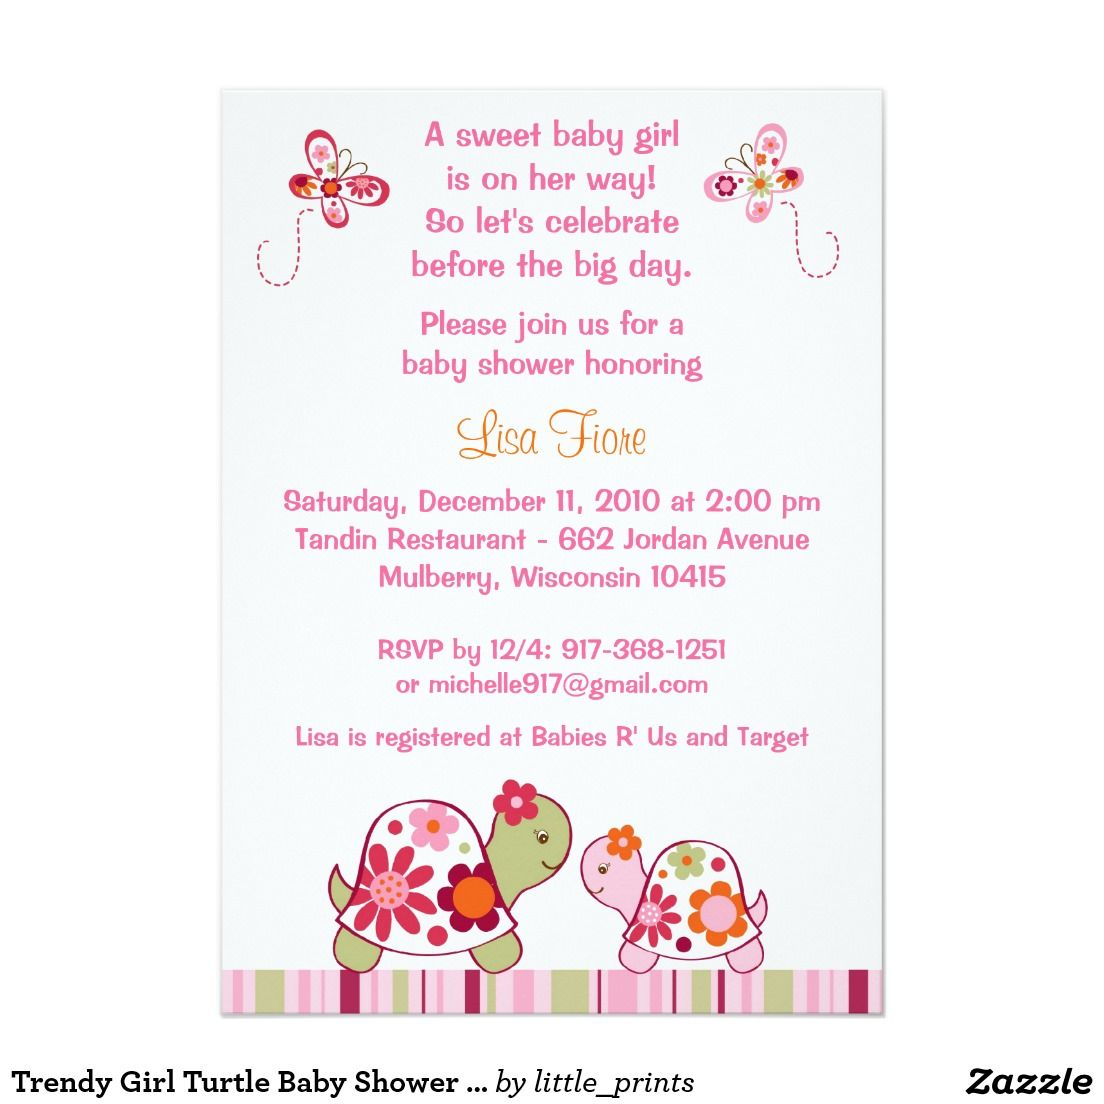 Trendy Girl Turtle Baby Shower Invitations | Cute Girly Girl Baby ...